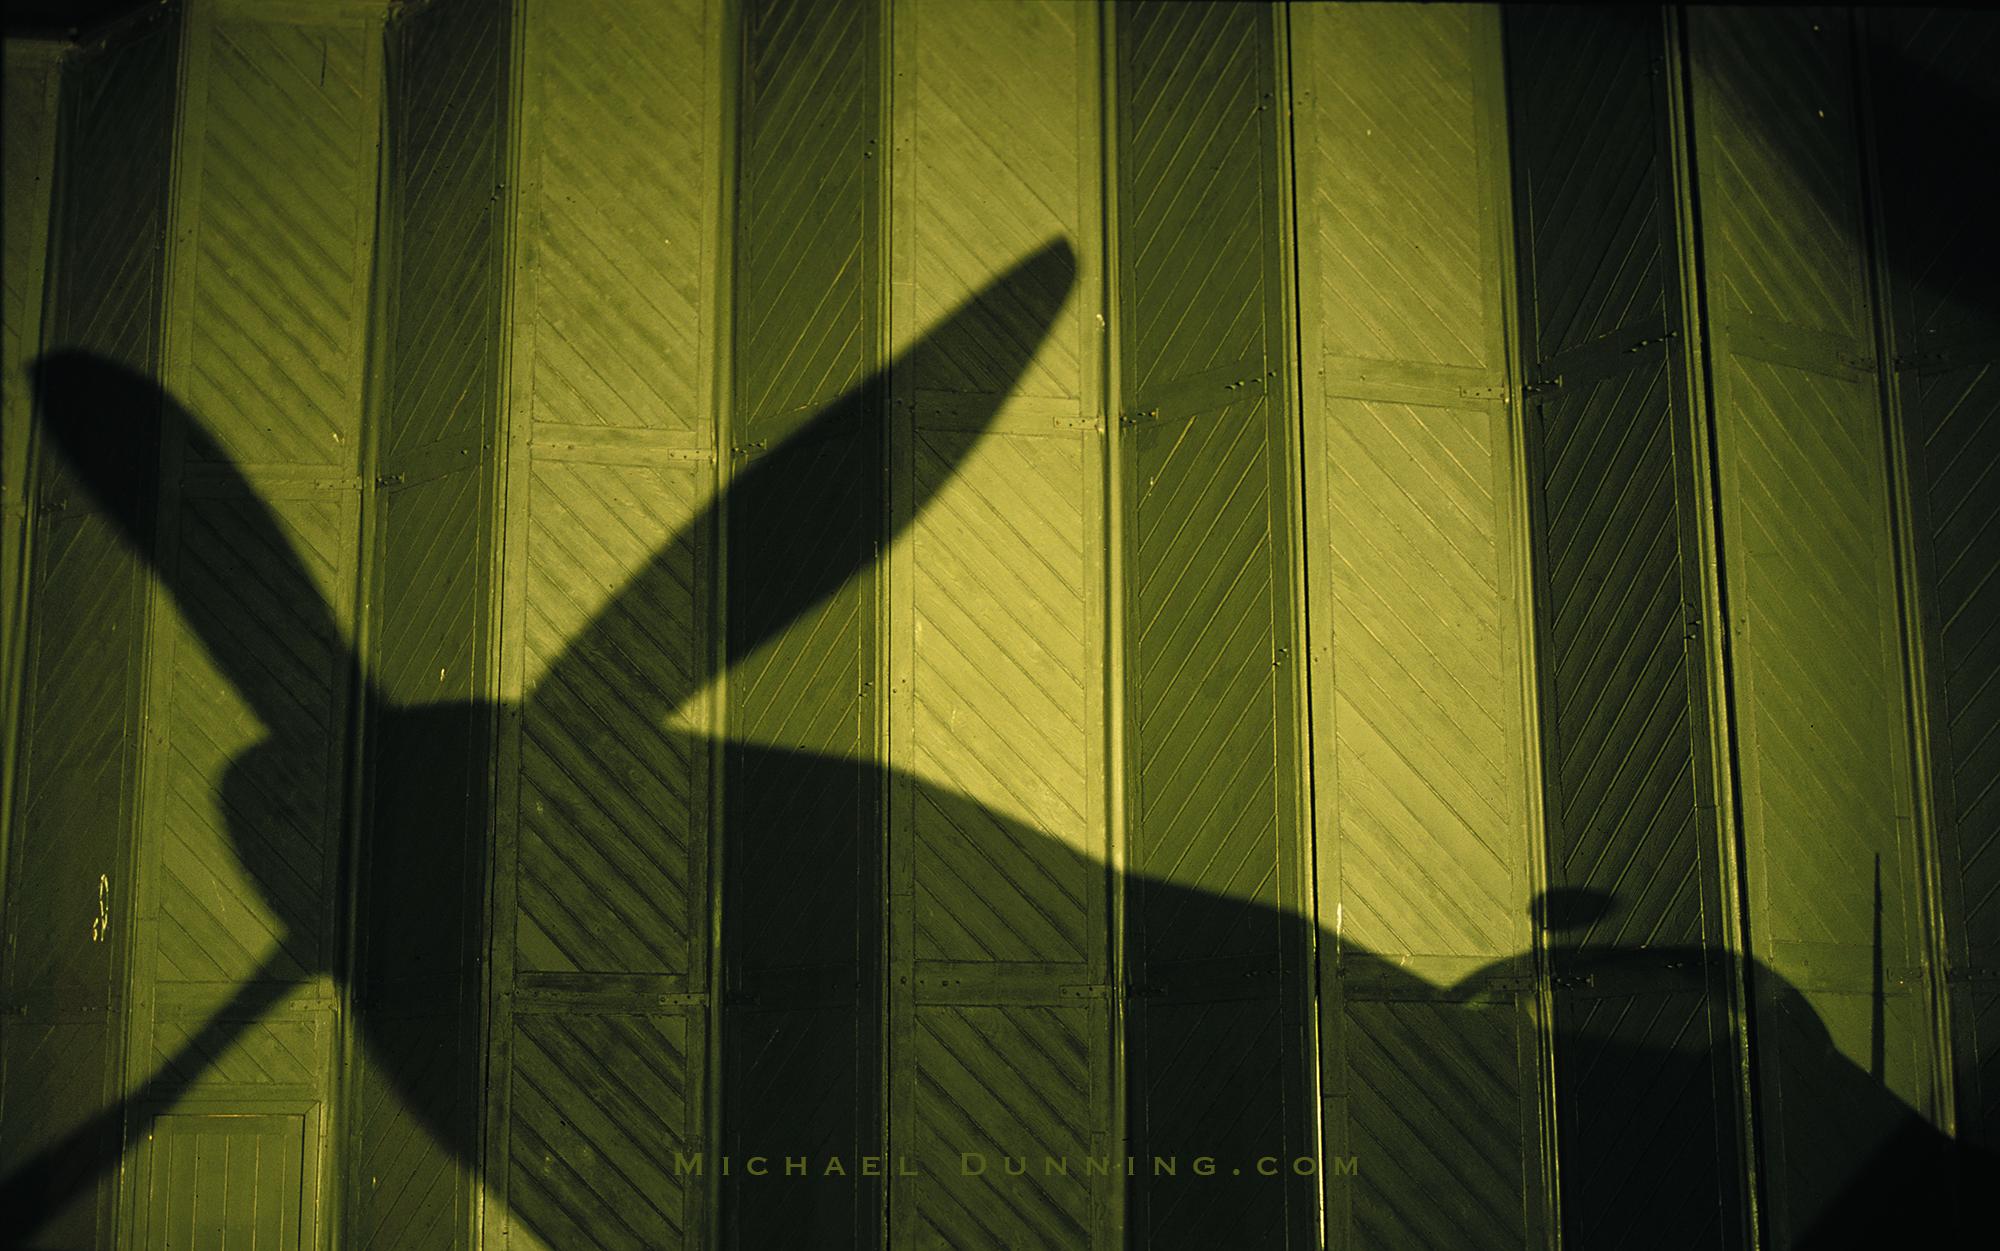 Breitling.Spitfire Shadow.jpg